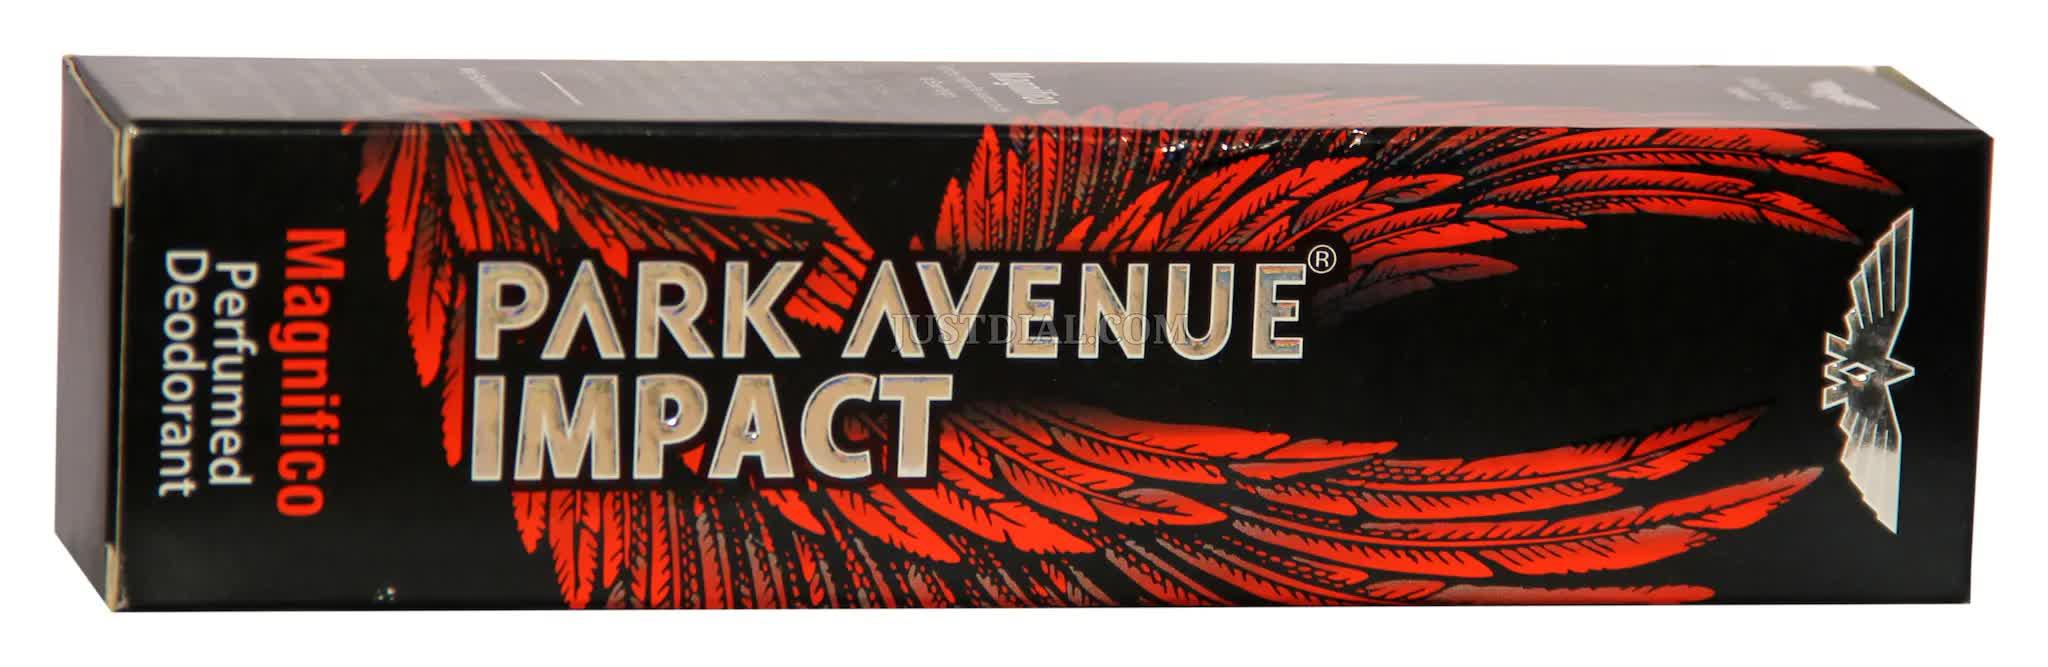 Park Avenue Impact Perfume Deo Spray 140 Ml